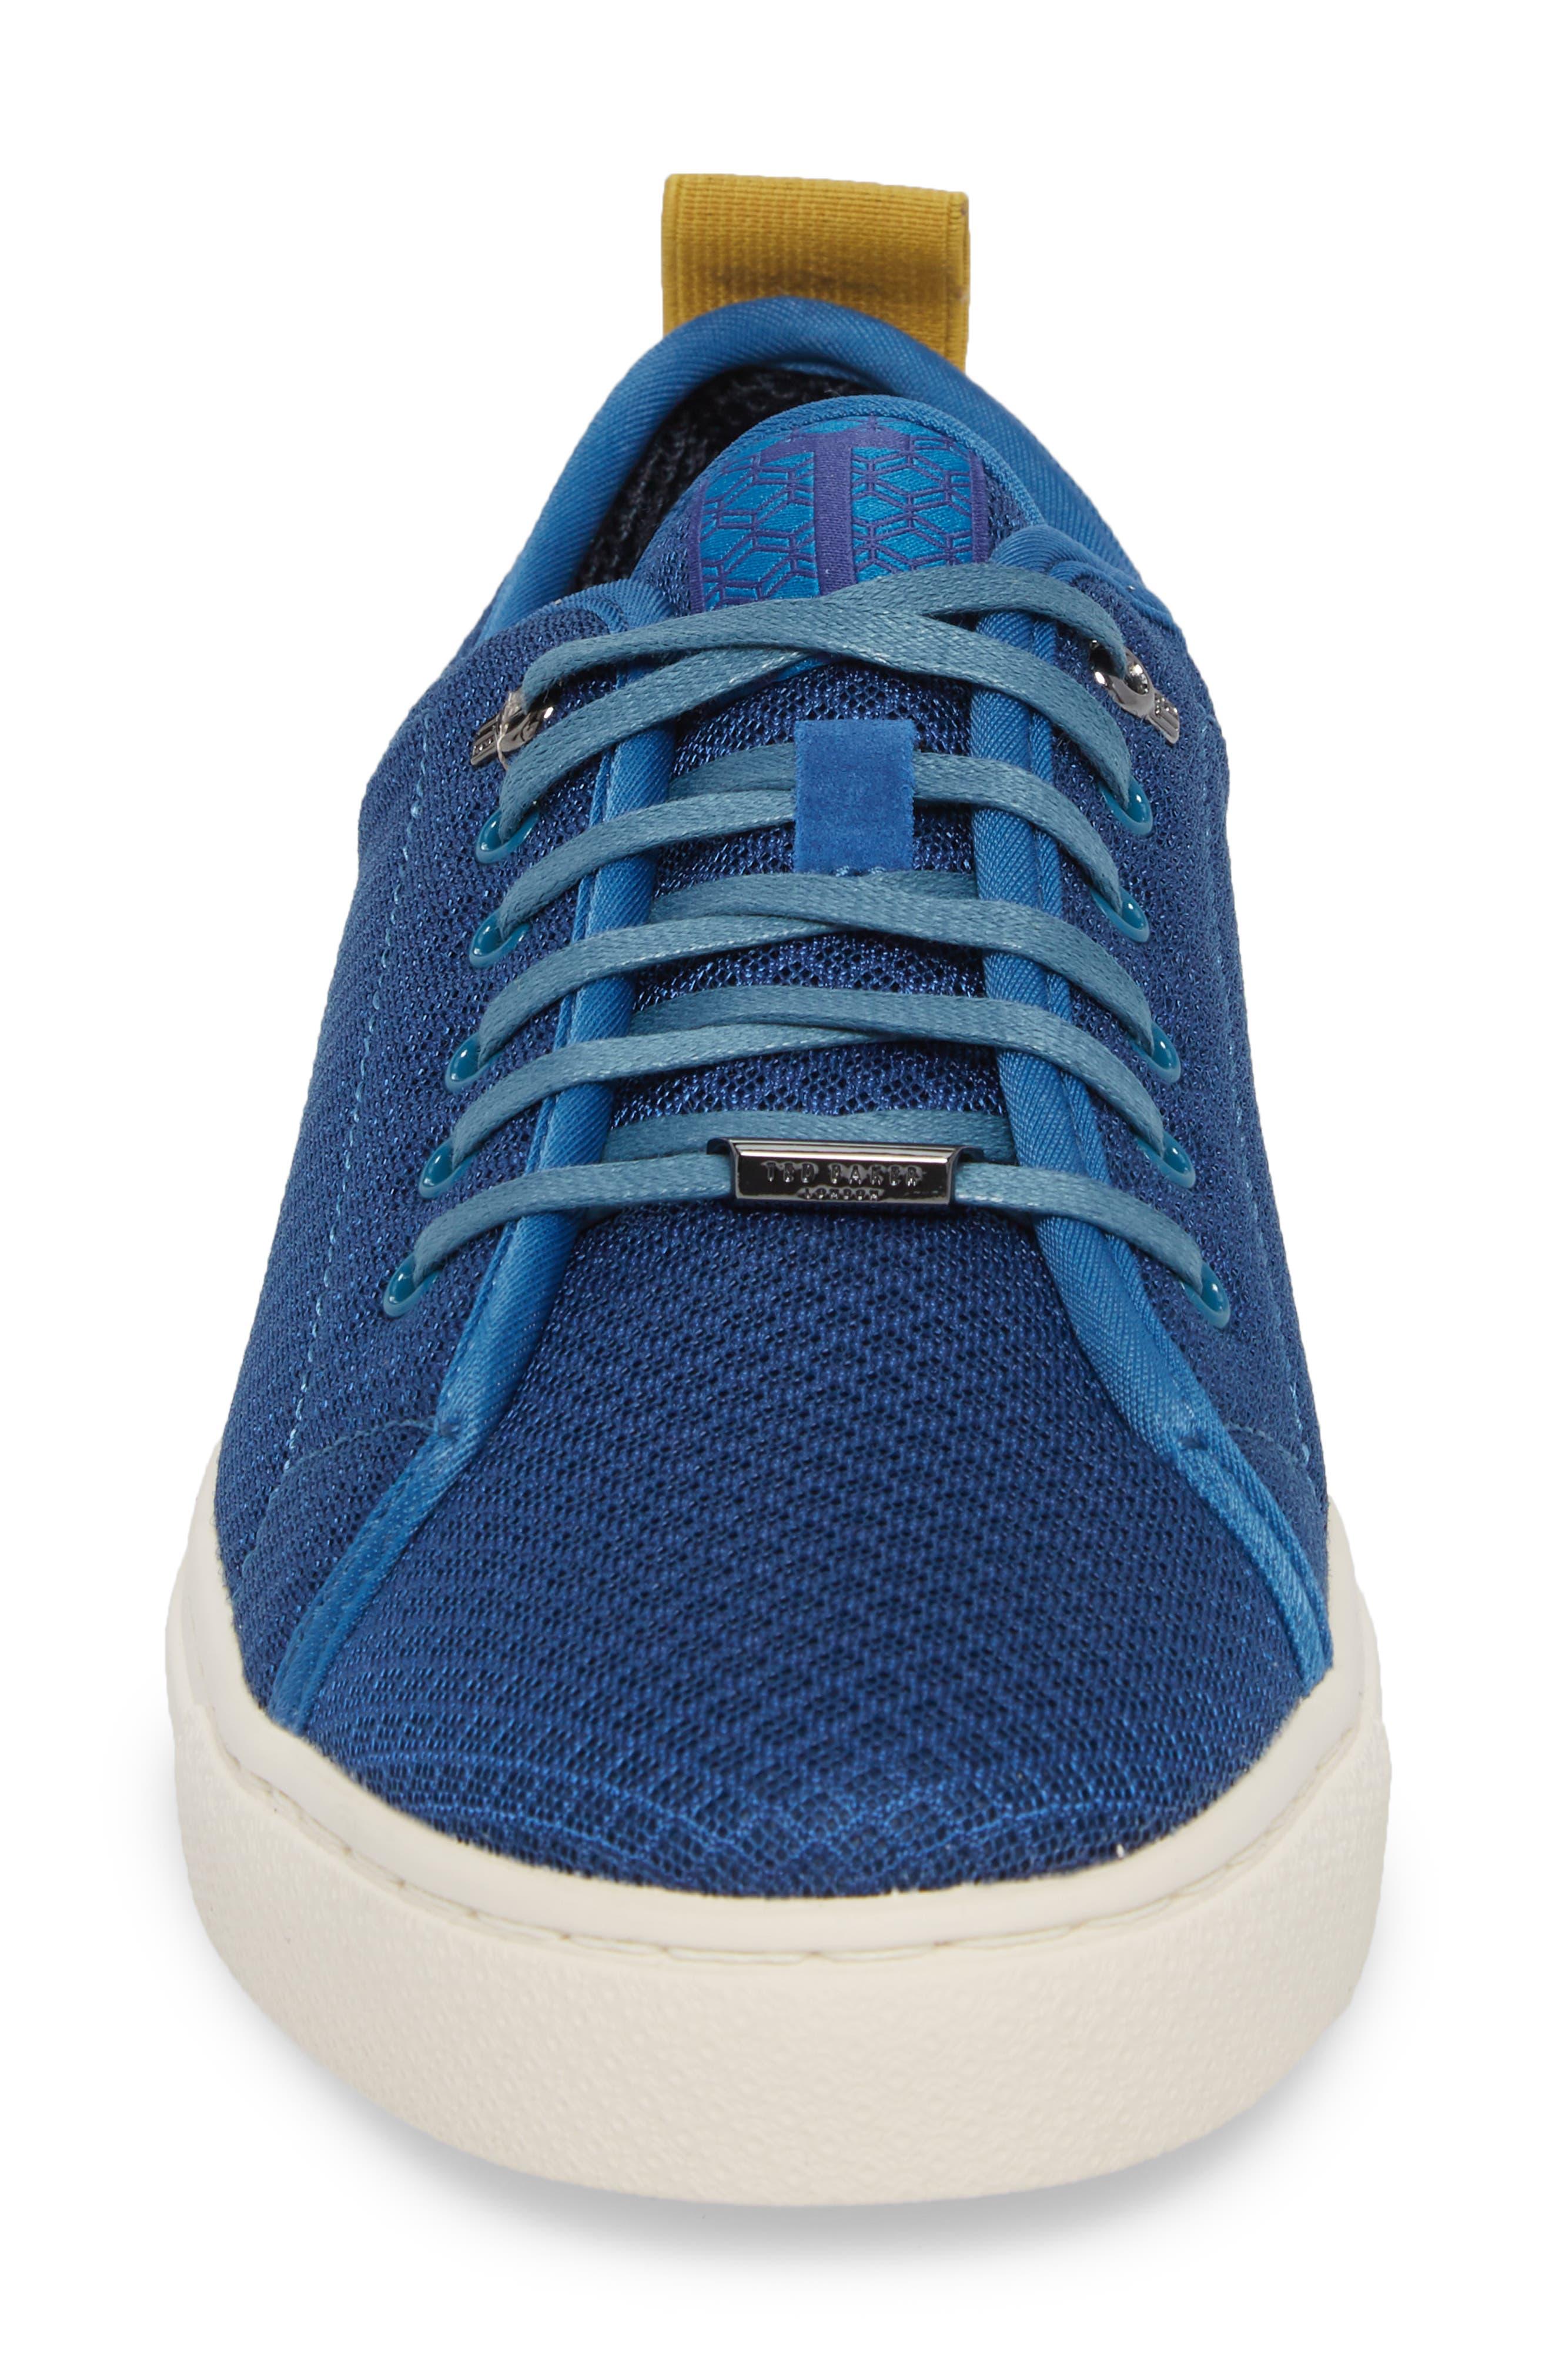 Lannse Low Top Mesh Sneaker,                             Alternate thumbnail 4, color,                             454